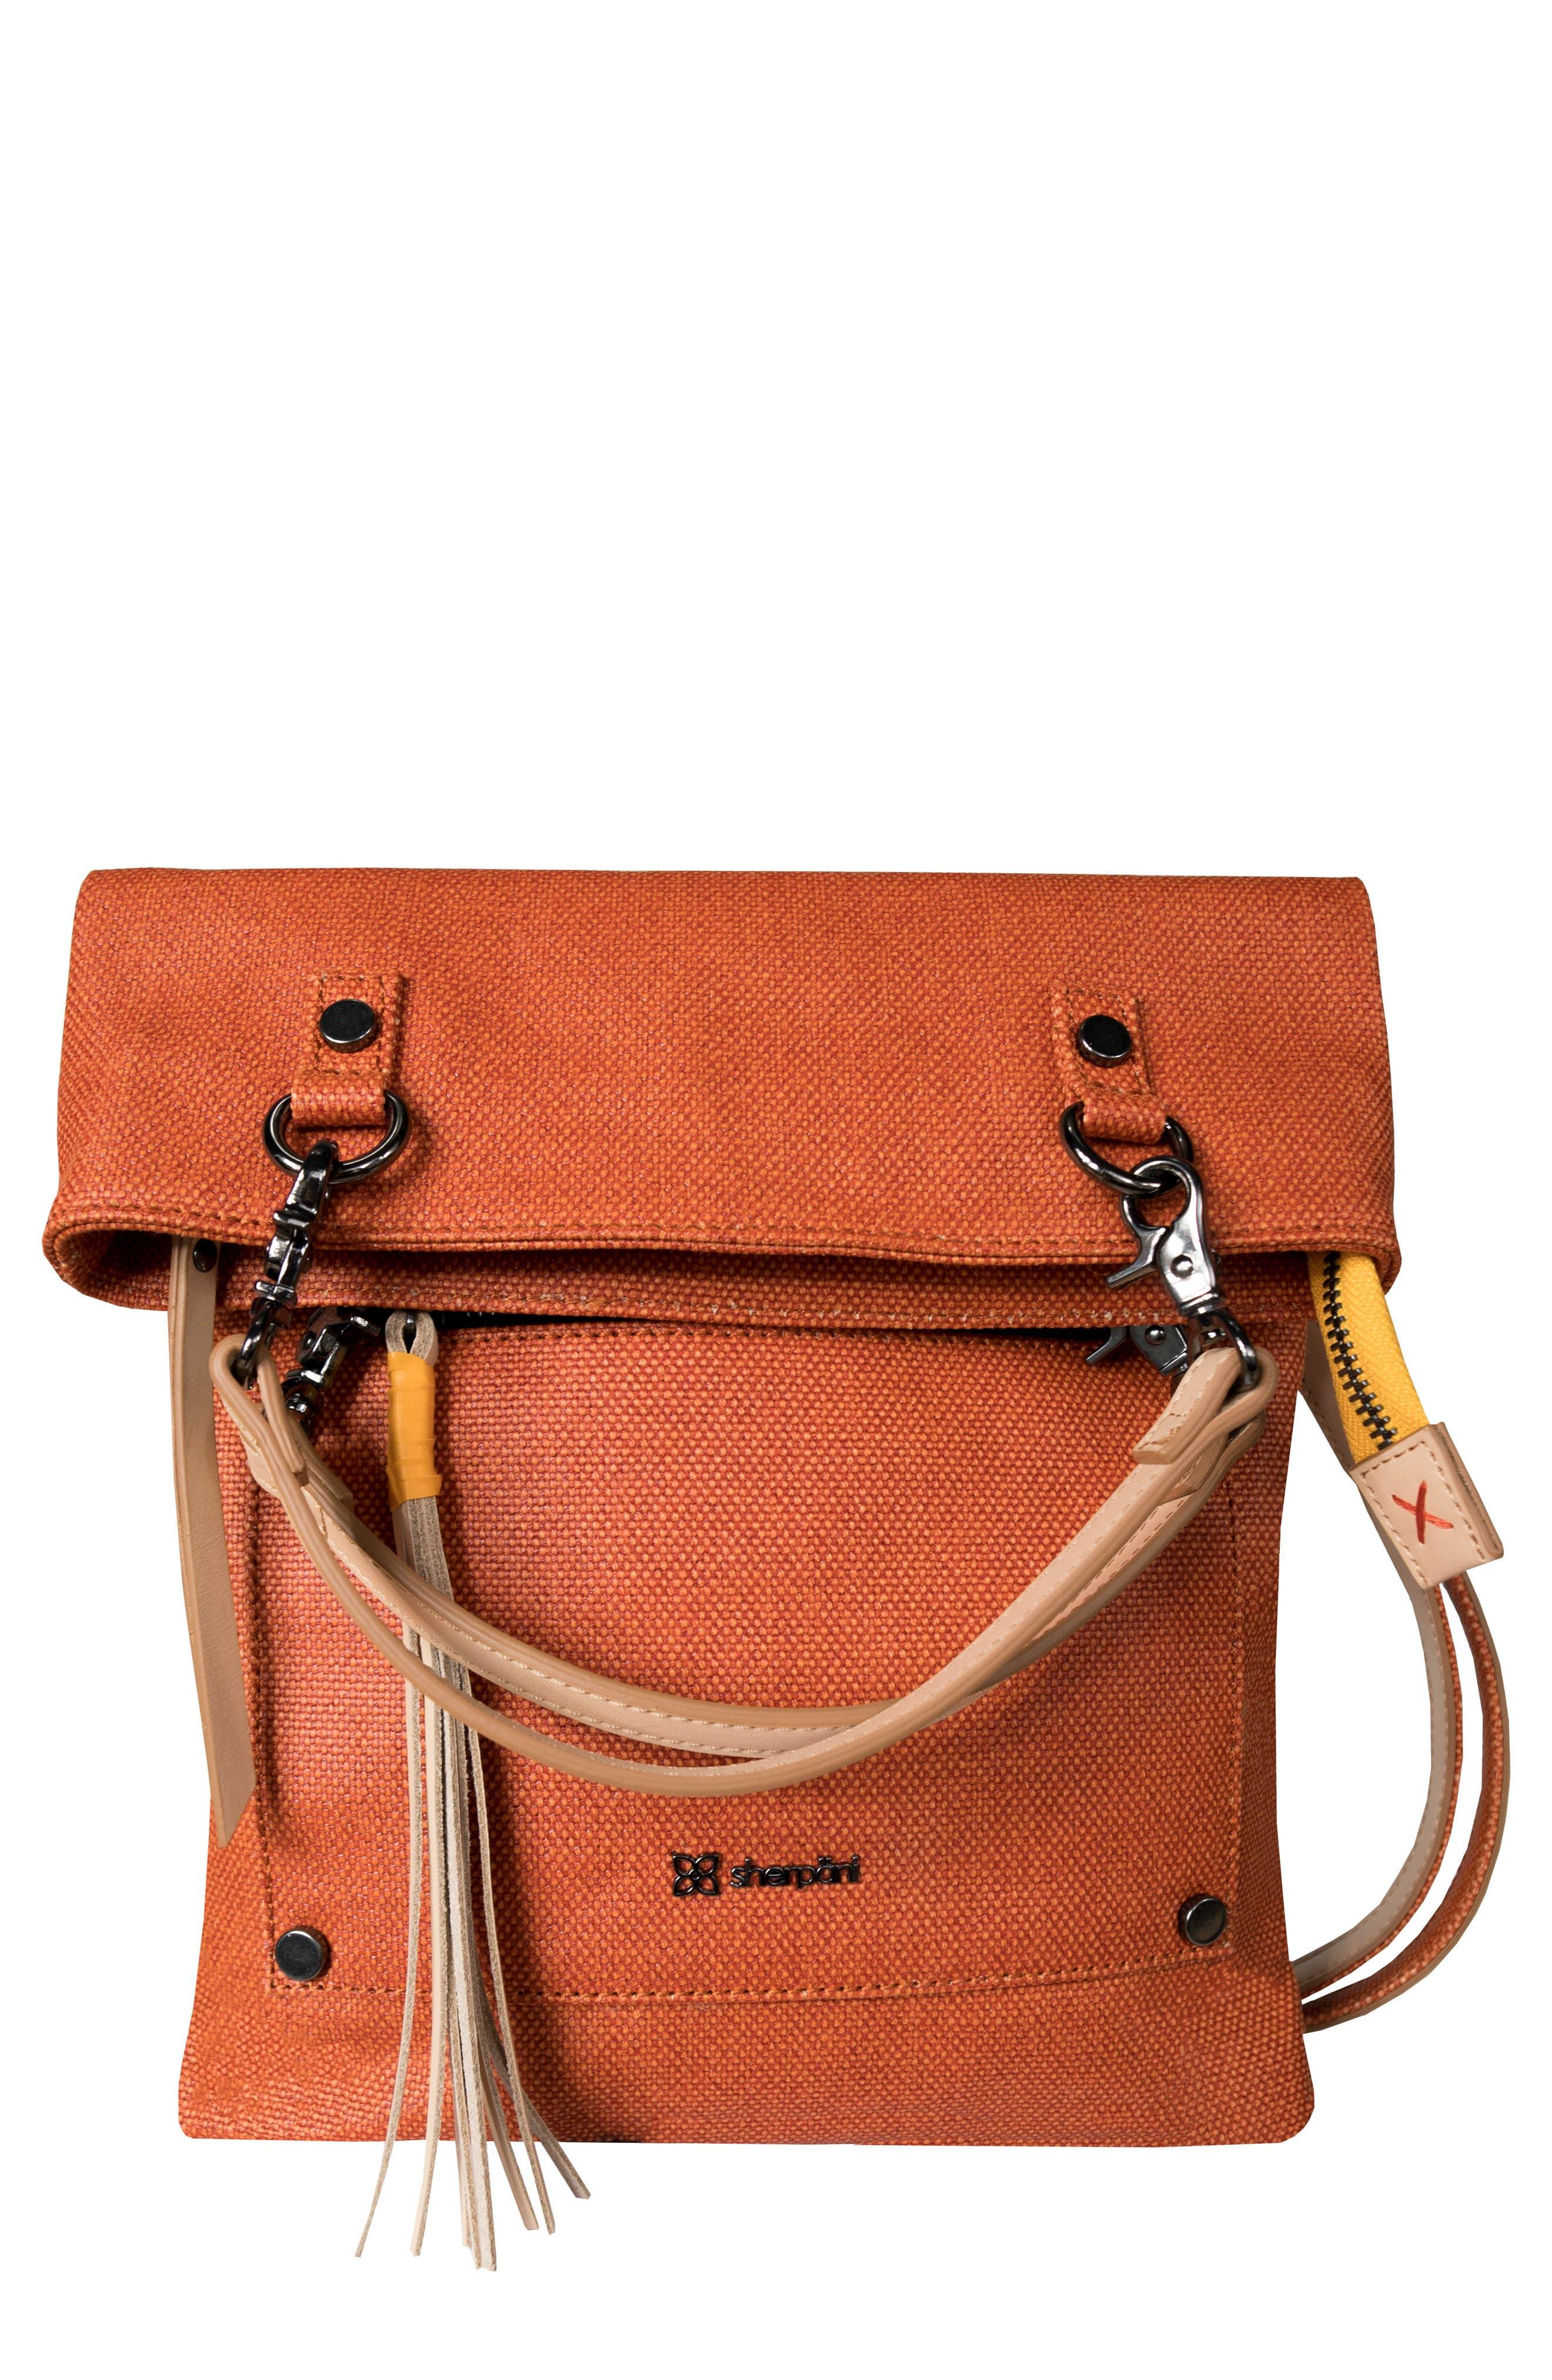 Rebel Coated Canvas Crossbody Bag,                             Main thumbnail 1, color,                             Copper